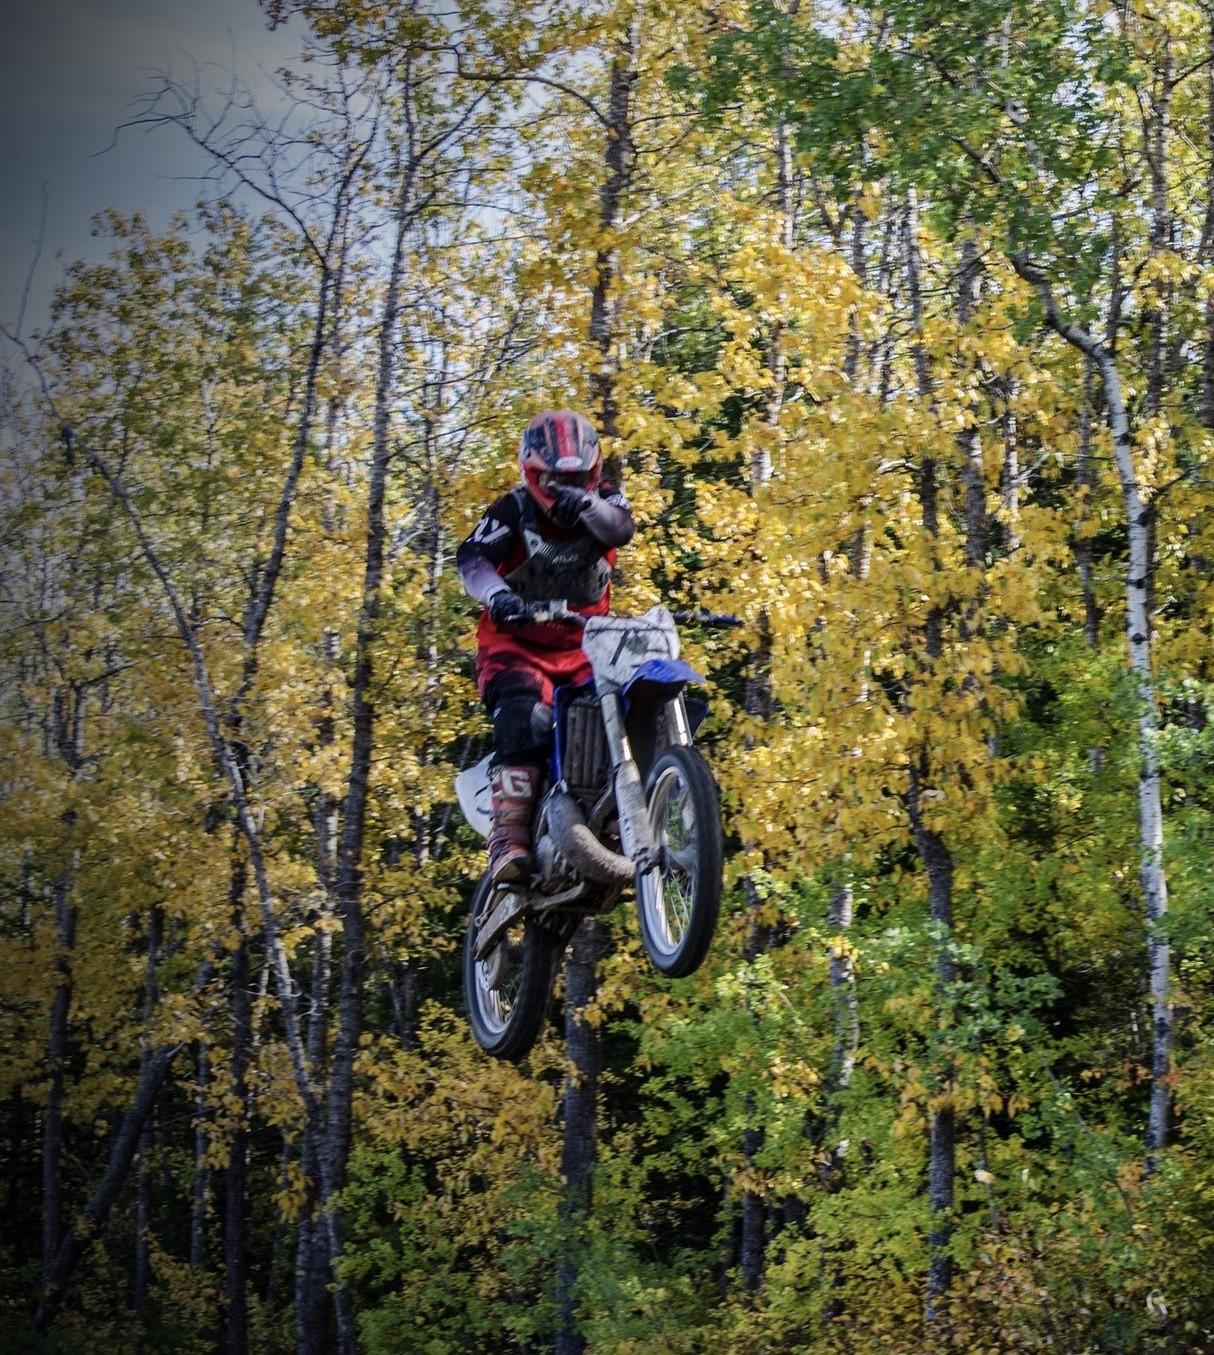 24F1F665-787A-4B67-B585-2D9C33583EF9 - whitechapel44 - Motocross Pictures - Vital MX